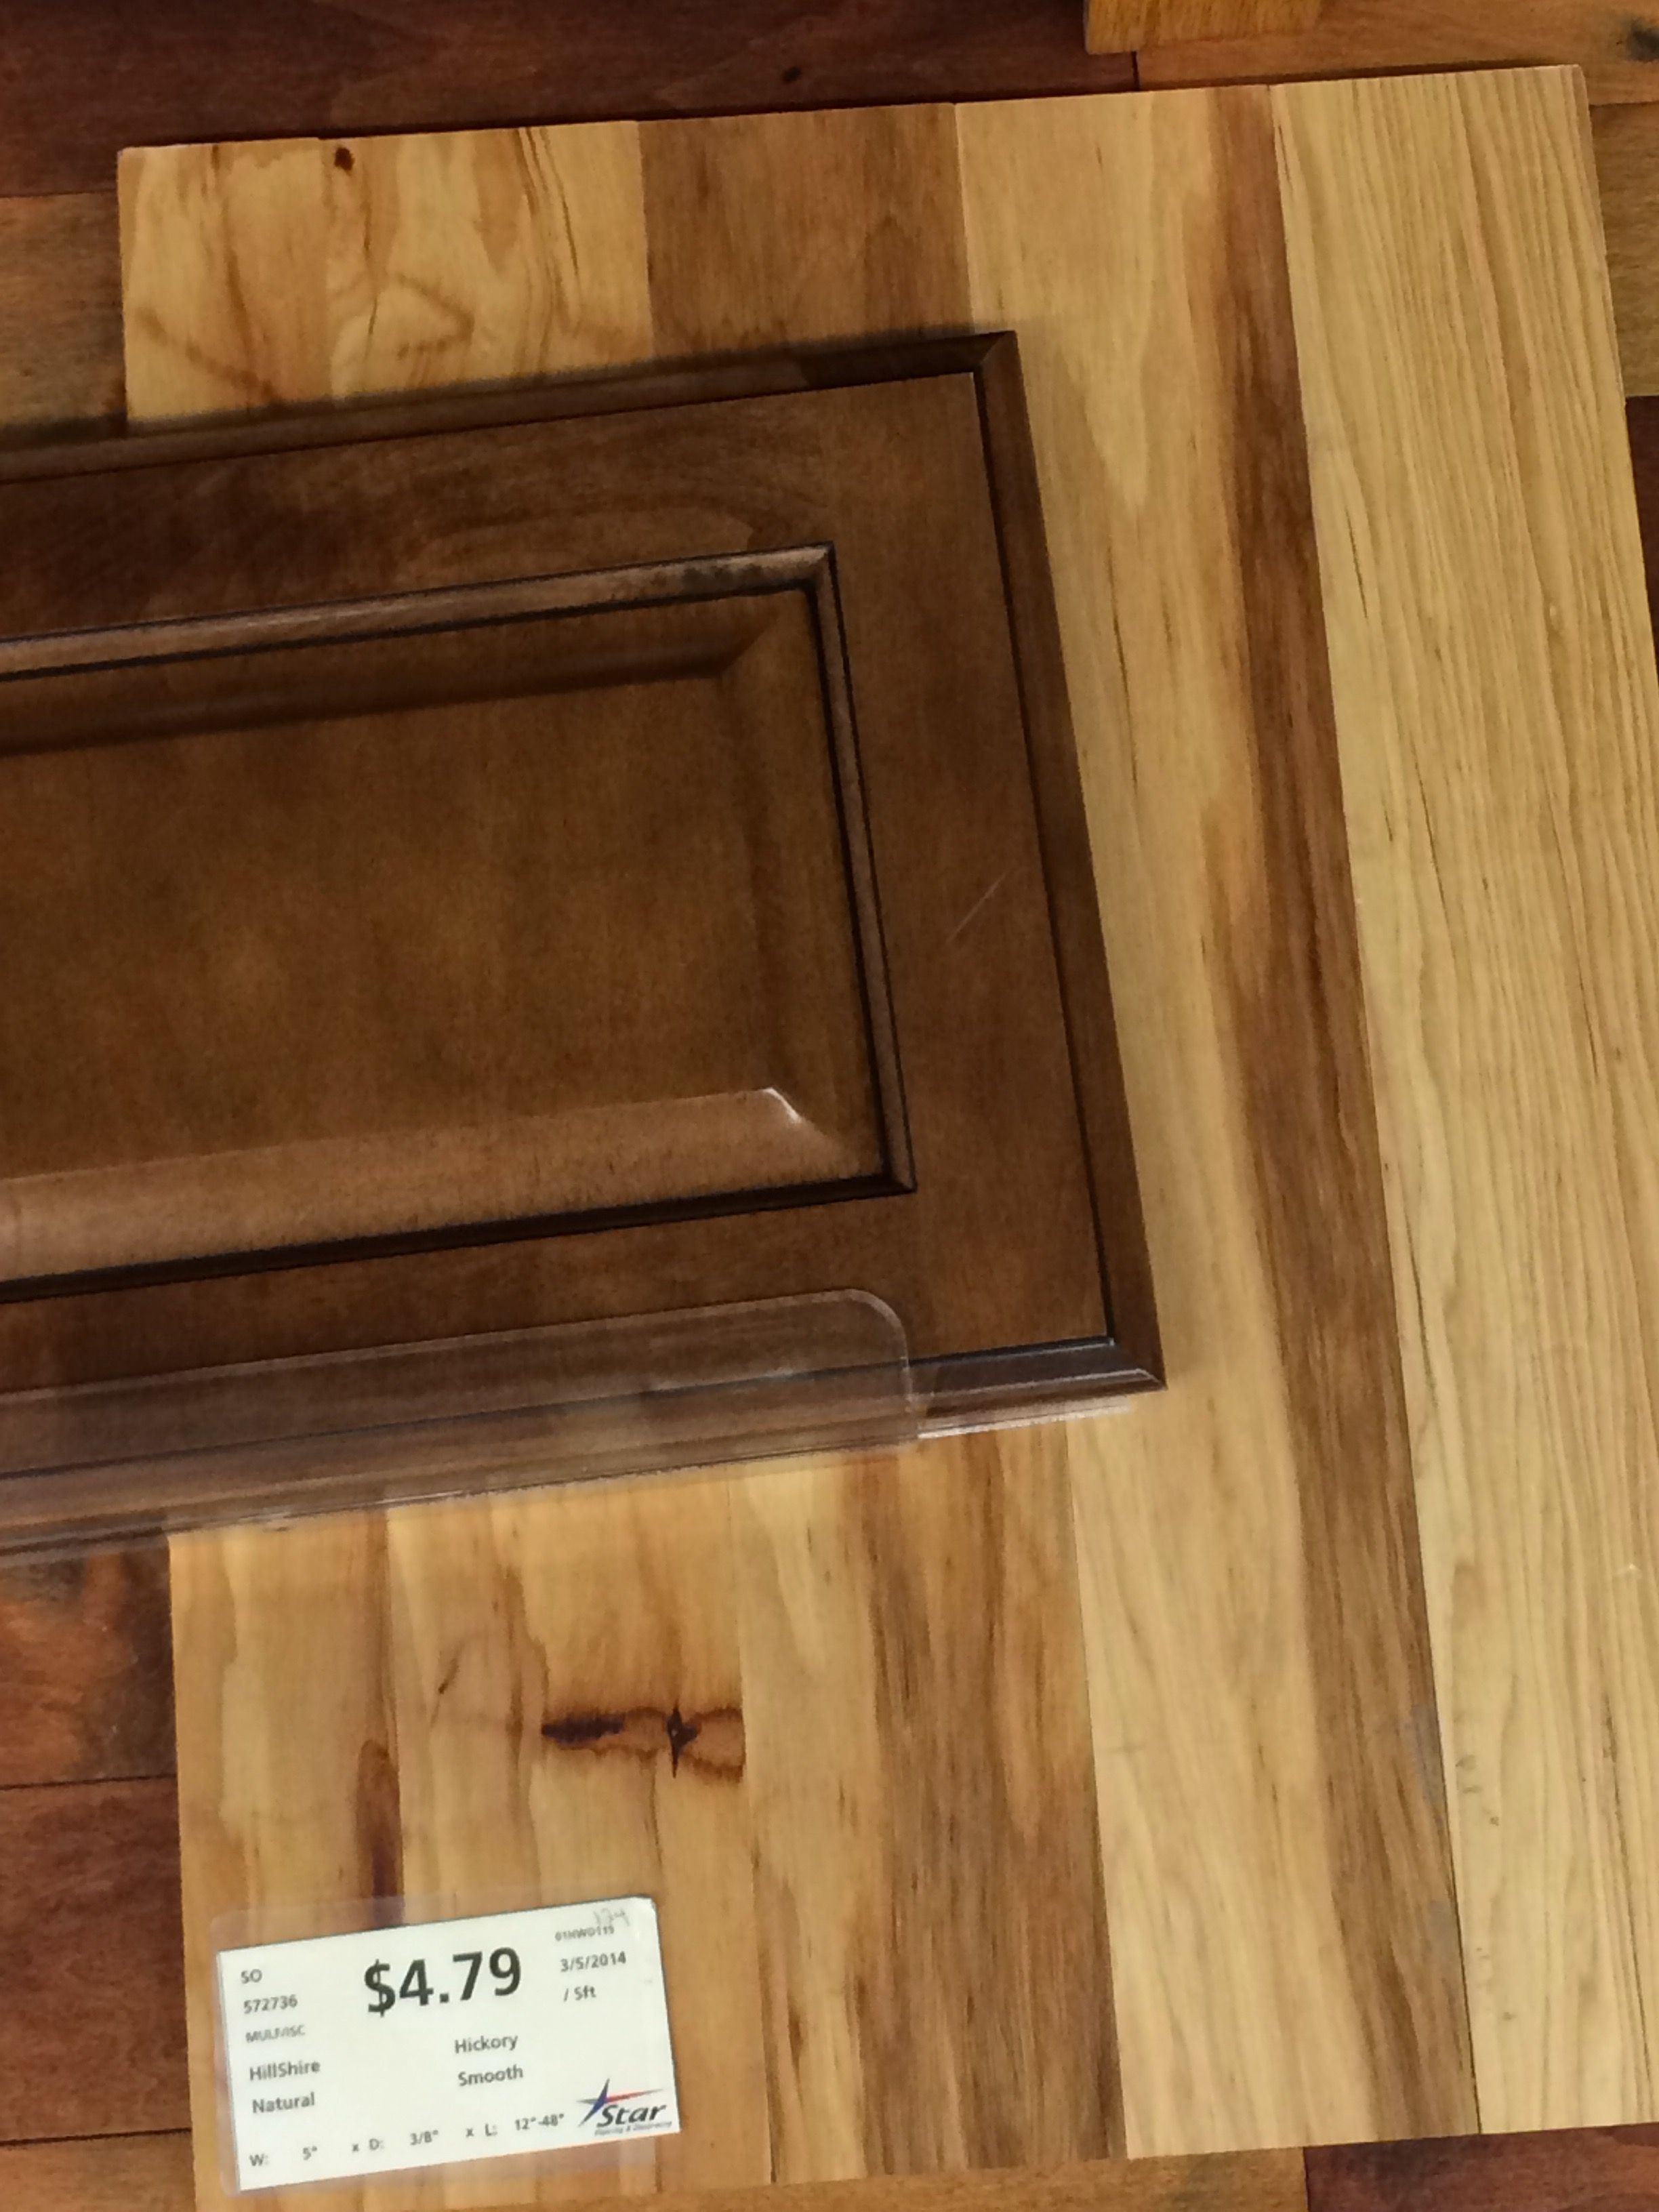 img floors products your hickory hand wood plank shamrock contact dealer flooring environeered gunsmoke flooringsolid hardwood scraped today